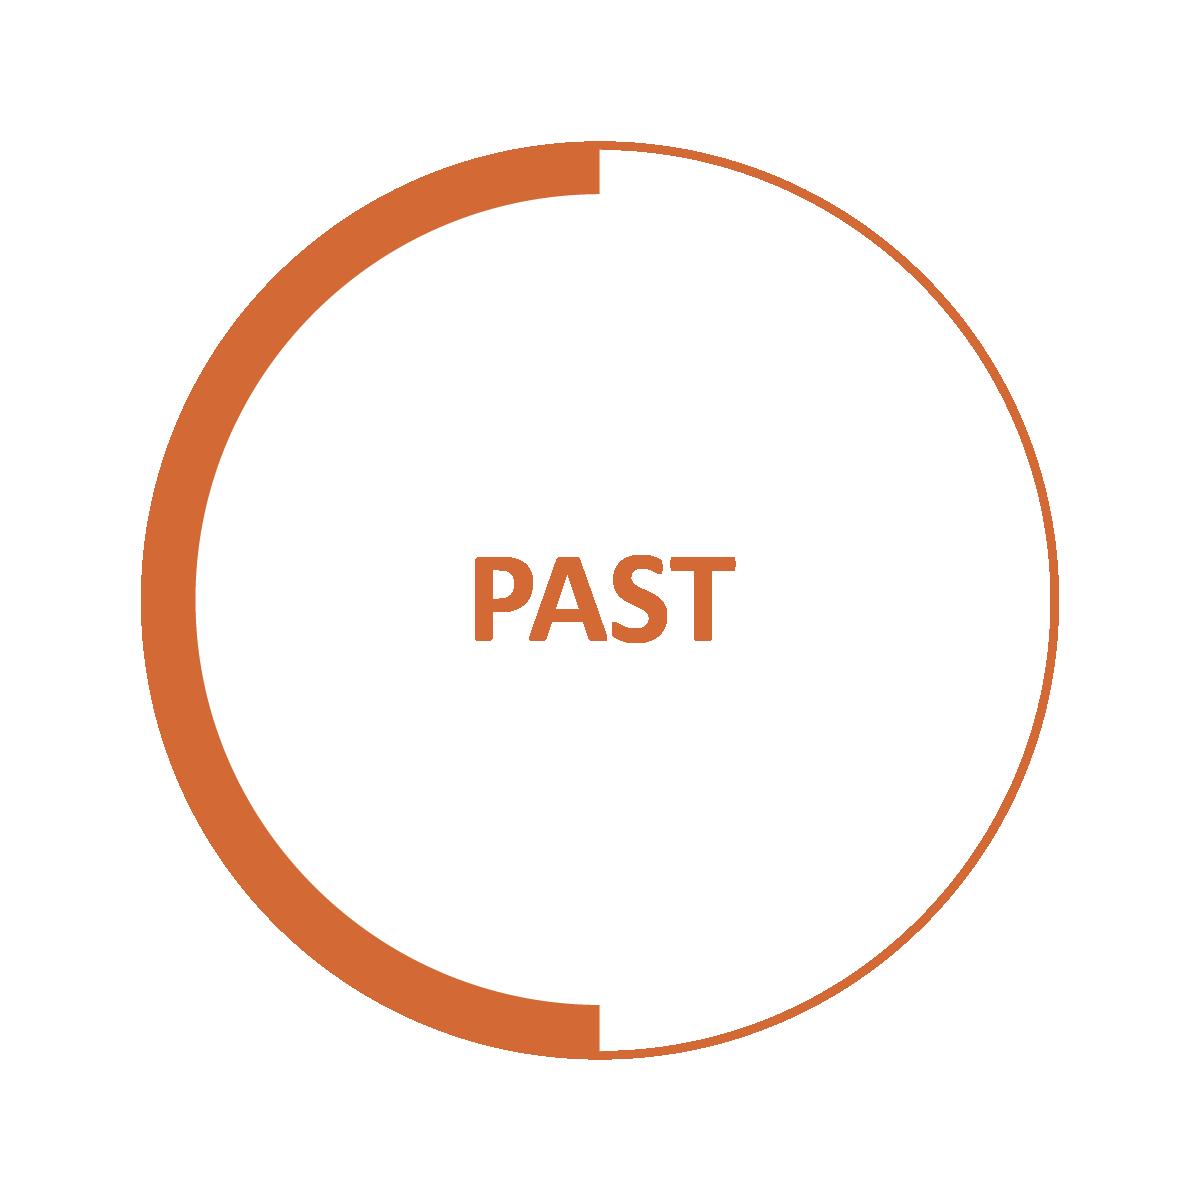 PAS PRESENT FUTURE-01.png